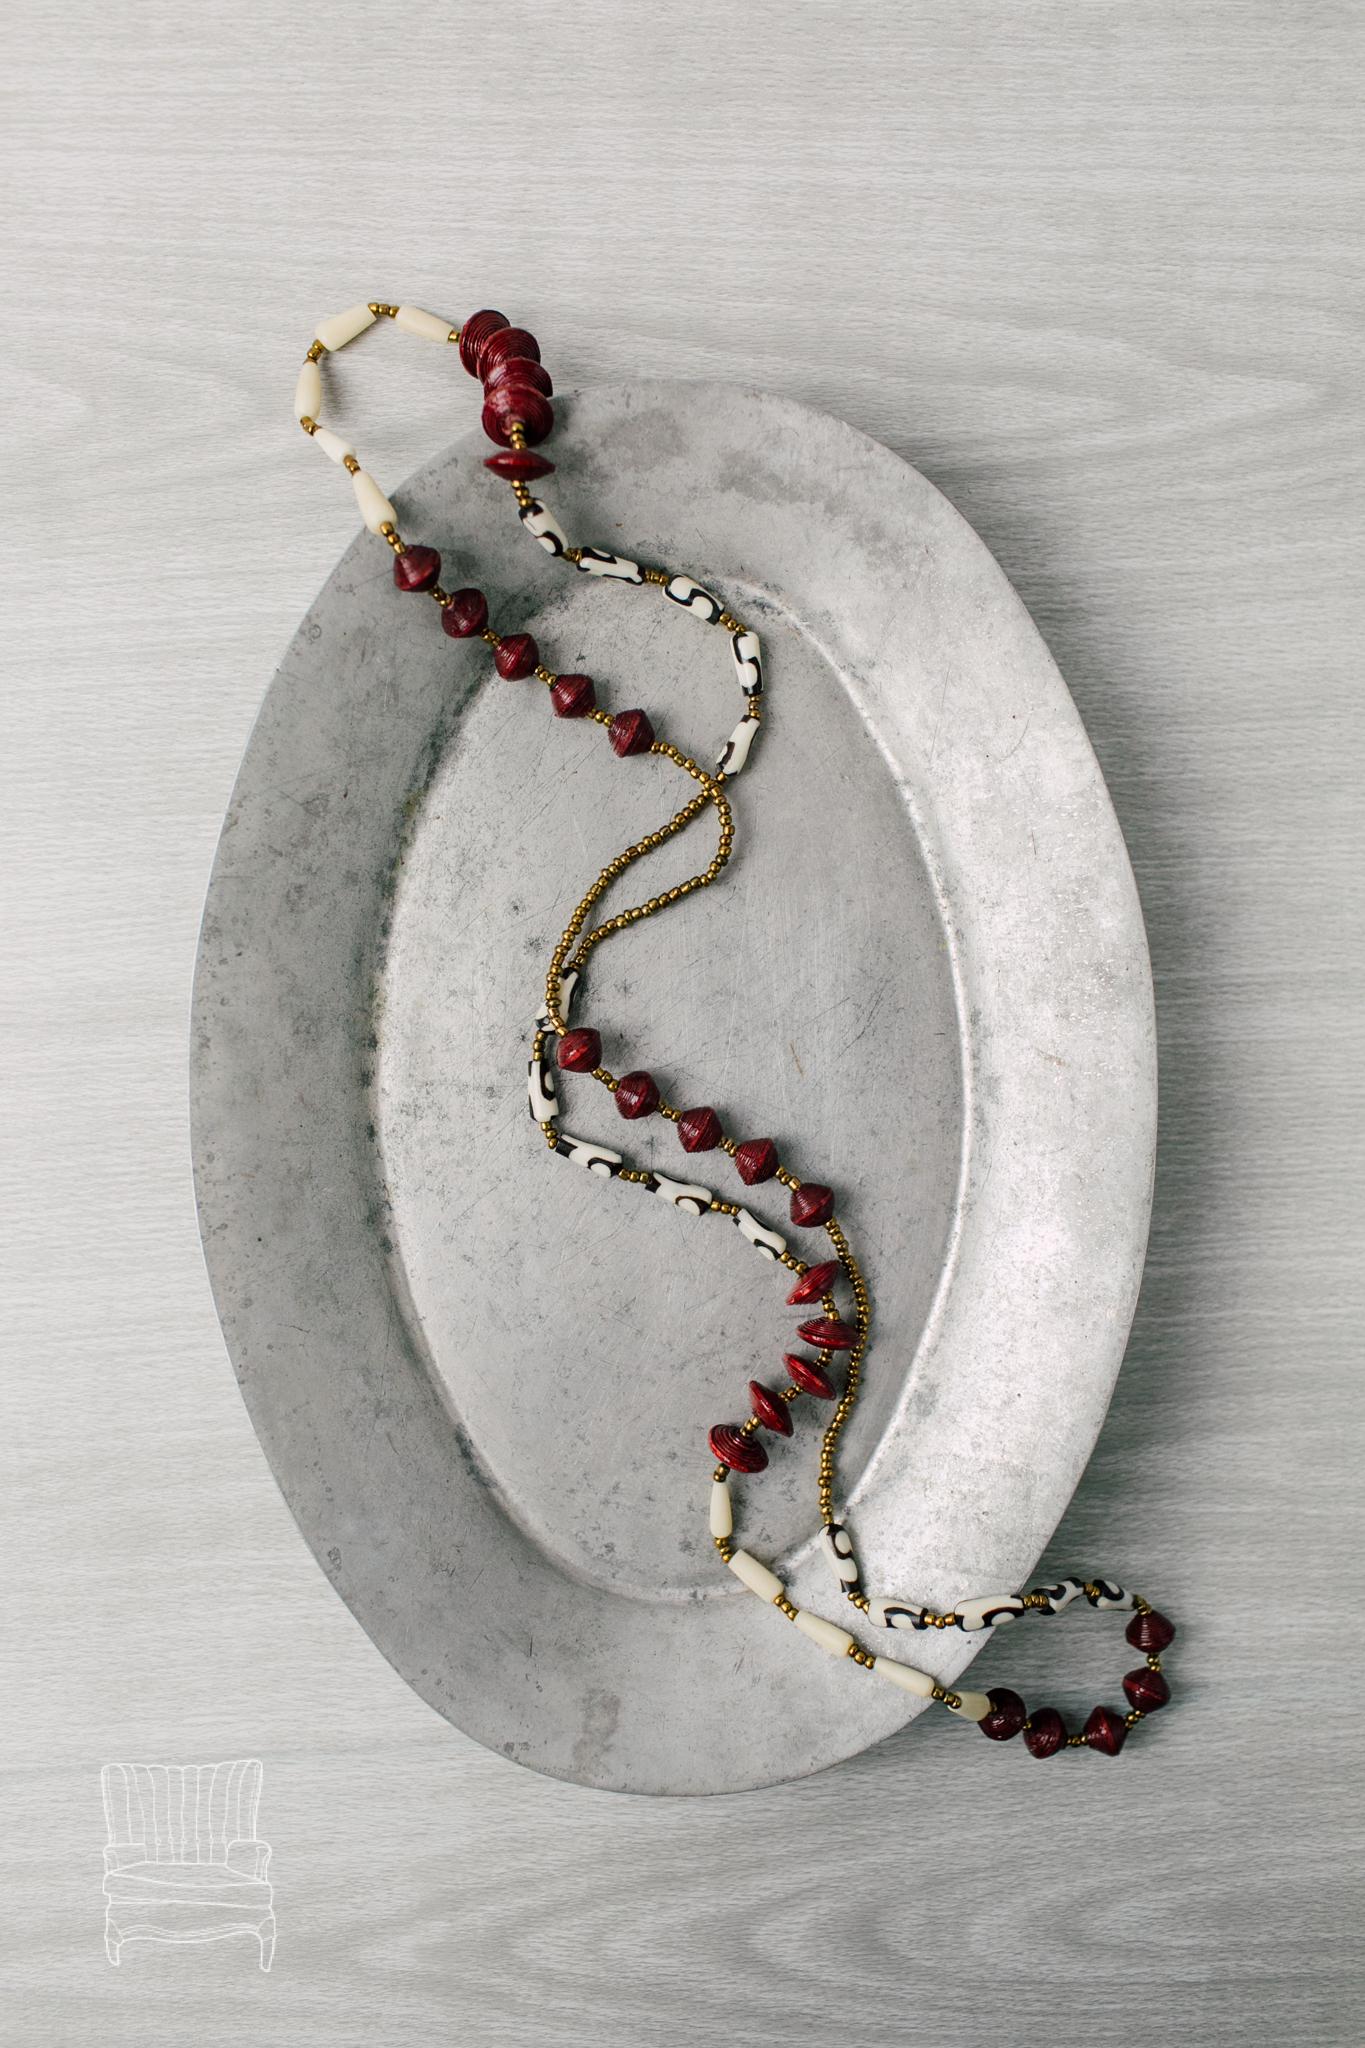 ajuna-jewelry-marketing-photographer-katheryn-moran-fall-2017-12.jpg